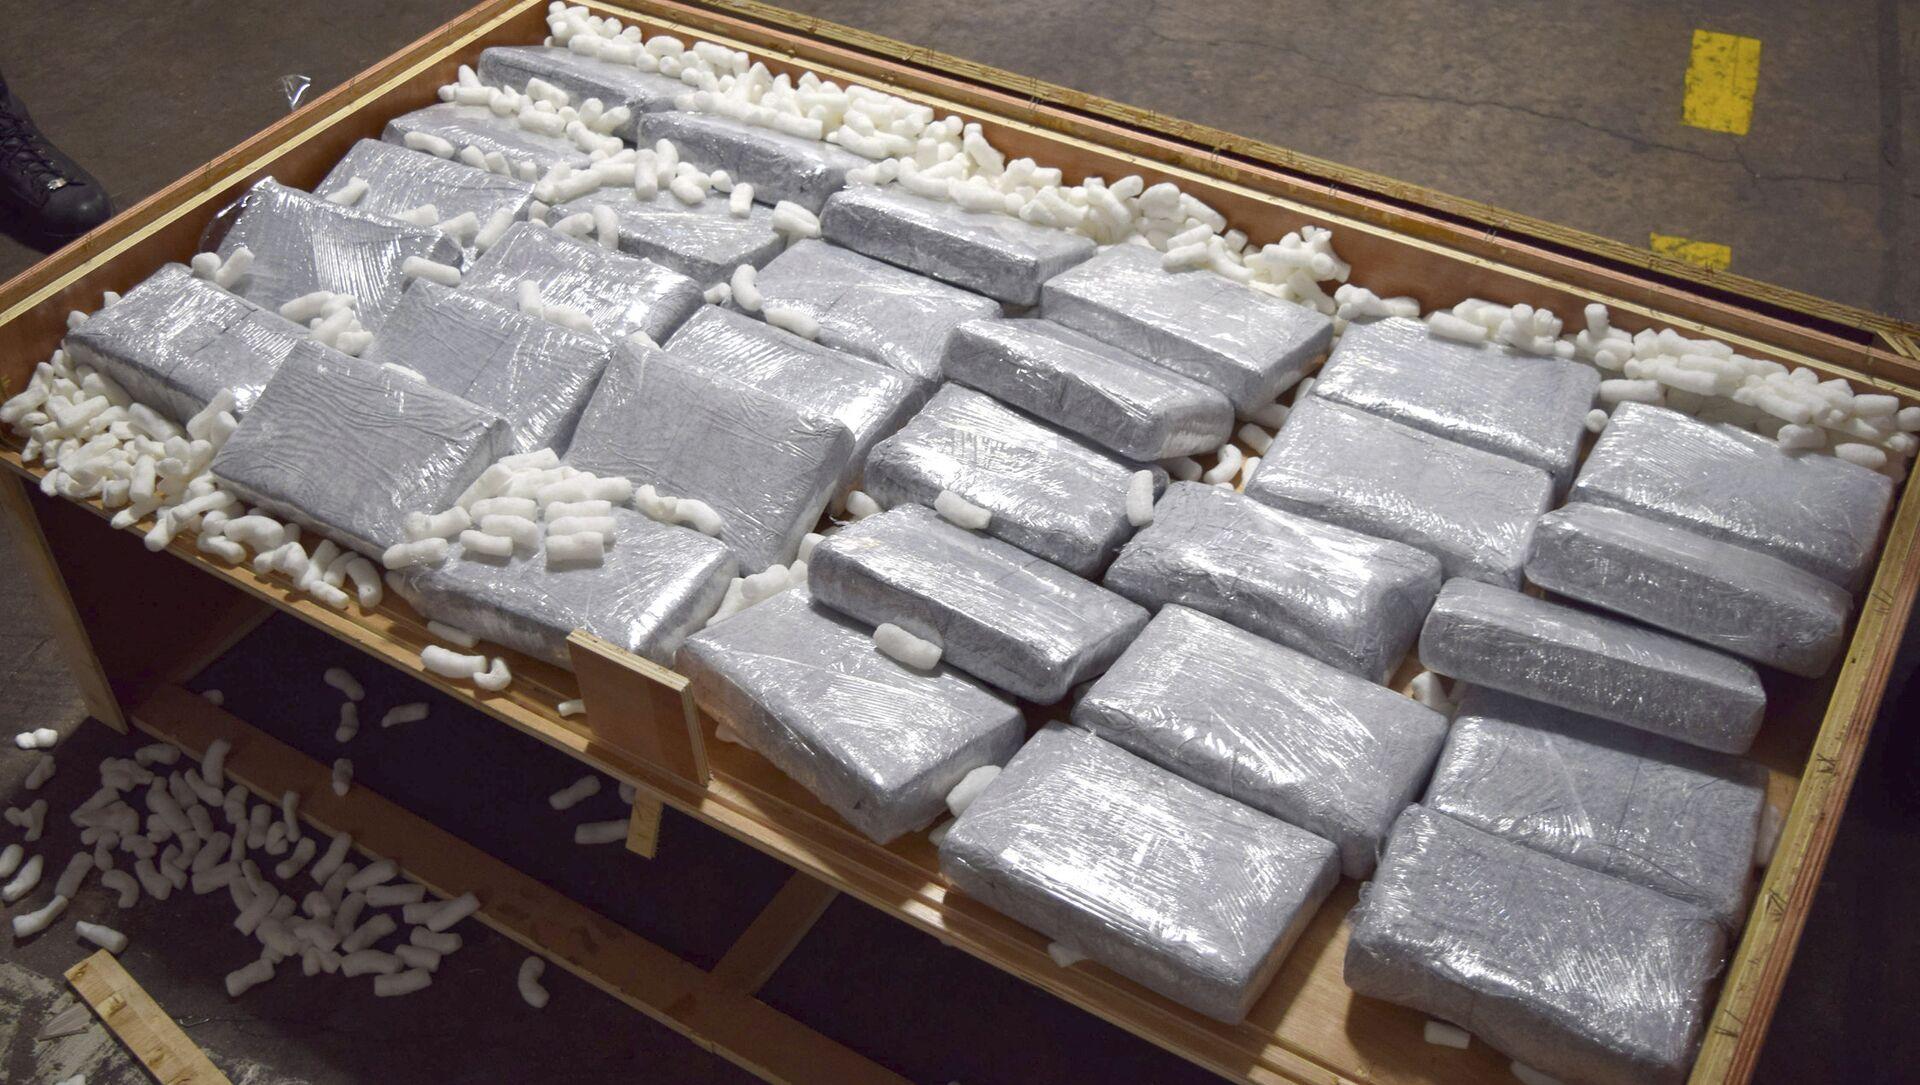 Un cargamento de drogas (archivo) - Sputnik Mundo, 1920, 18.11.2020